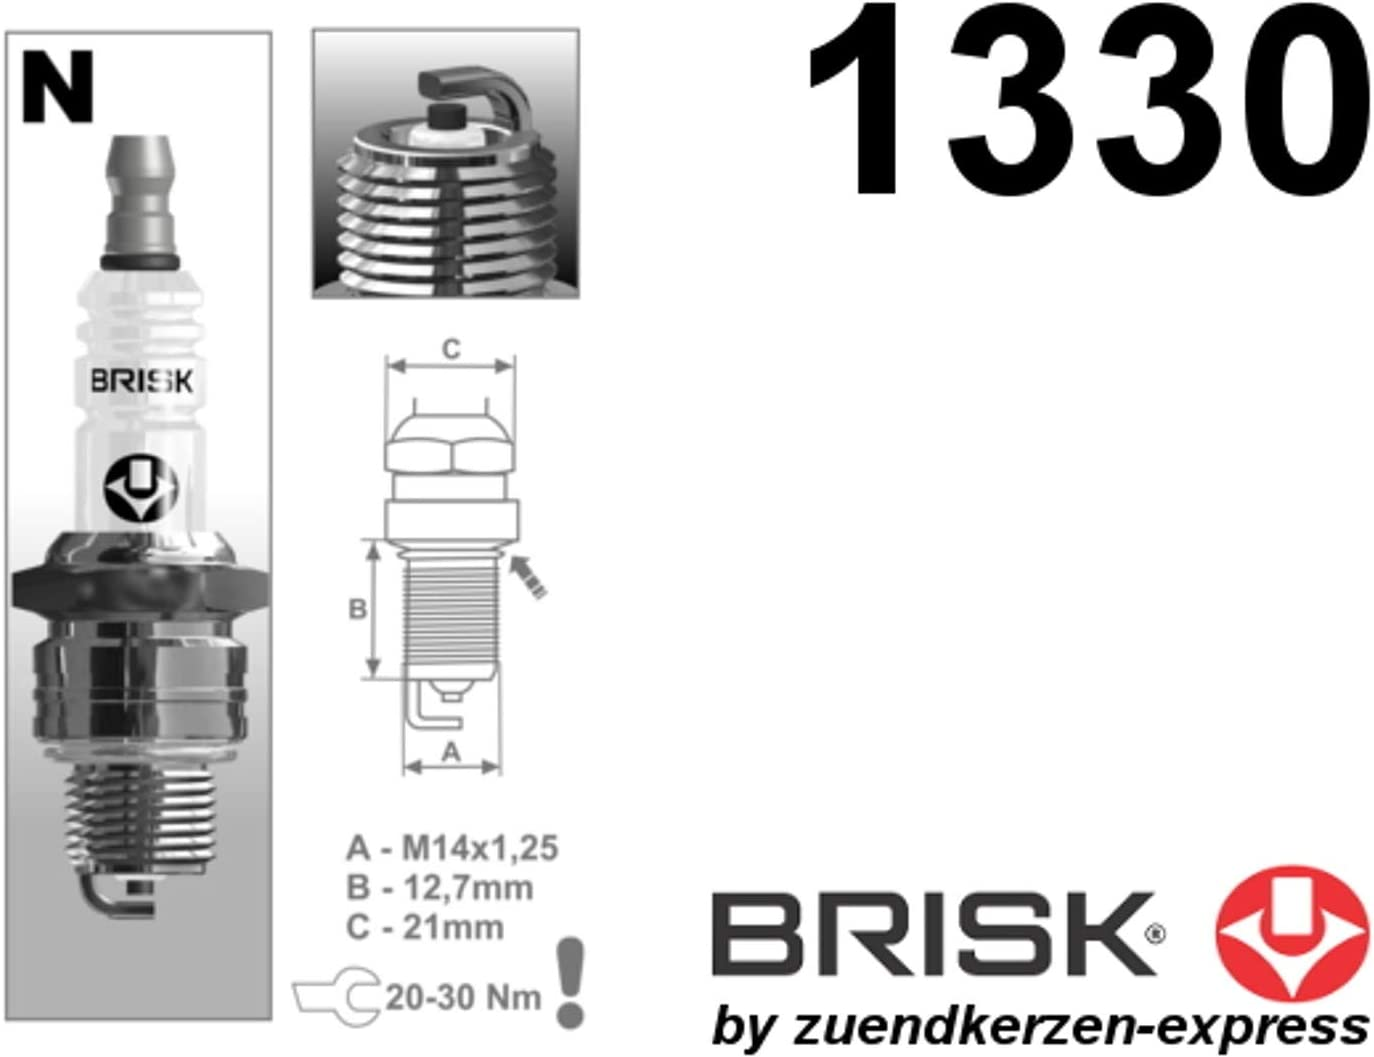 4 St/ück Brisk Super N15C 1330 Z/ündkerzen